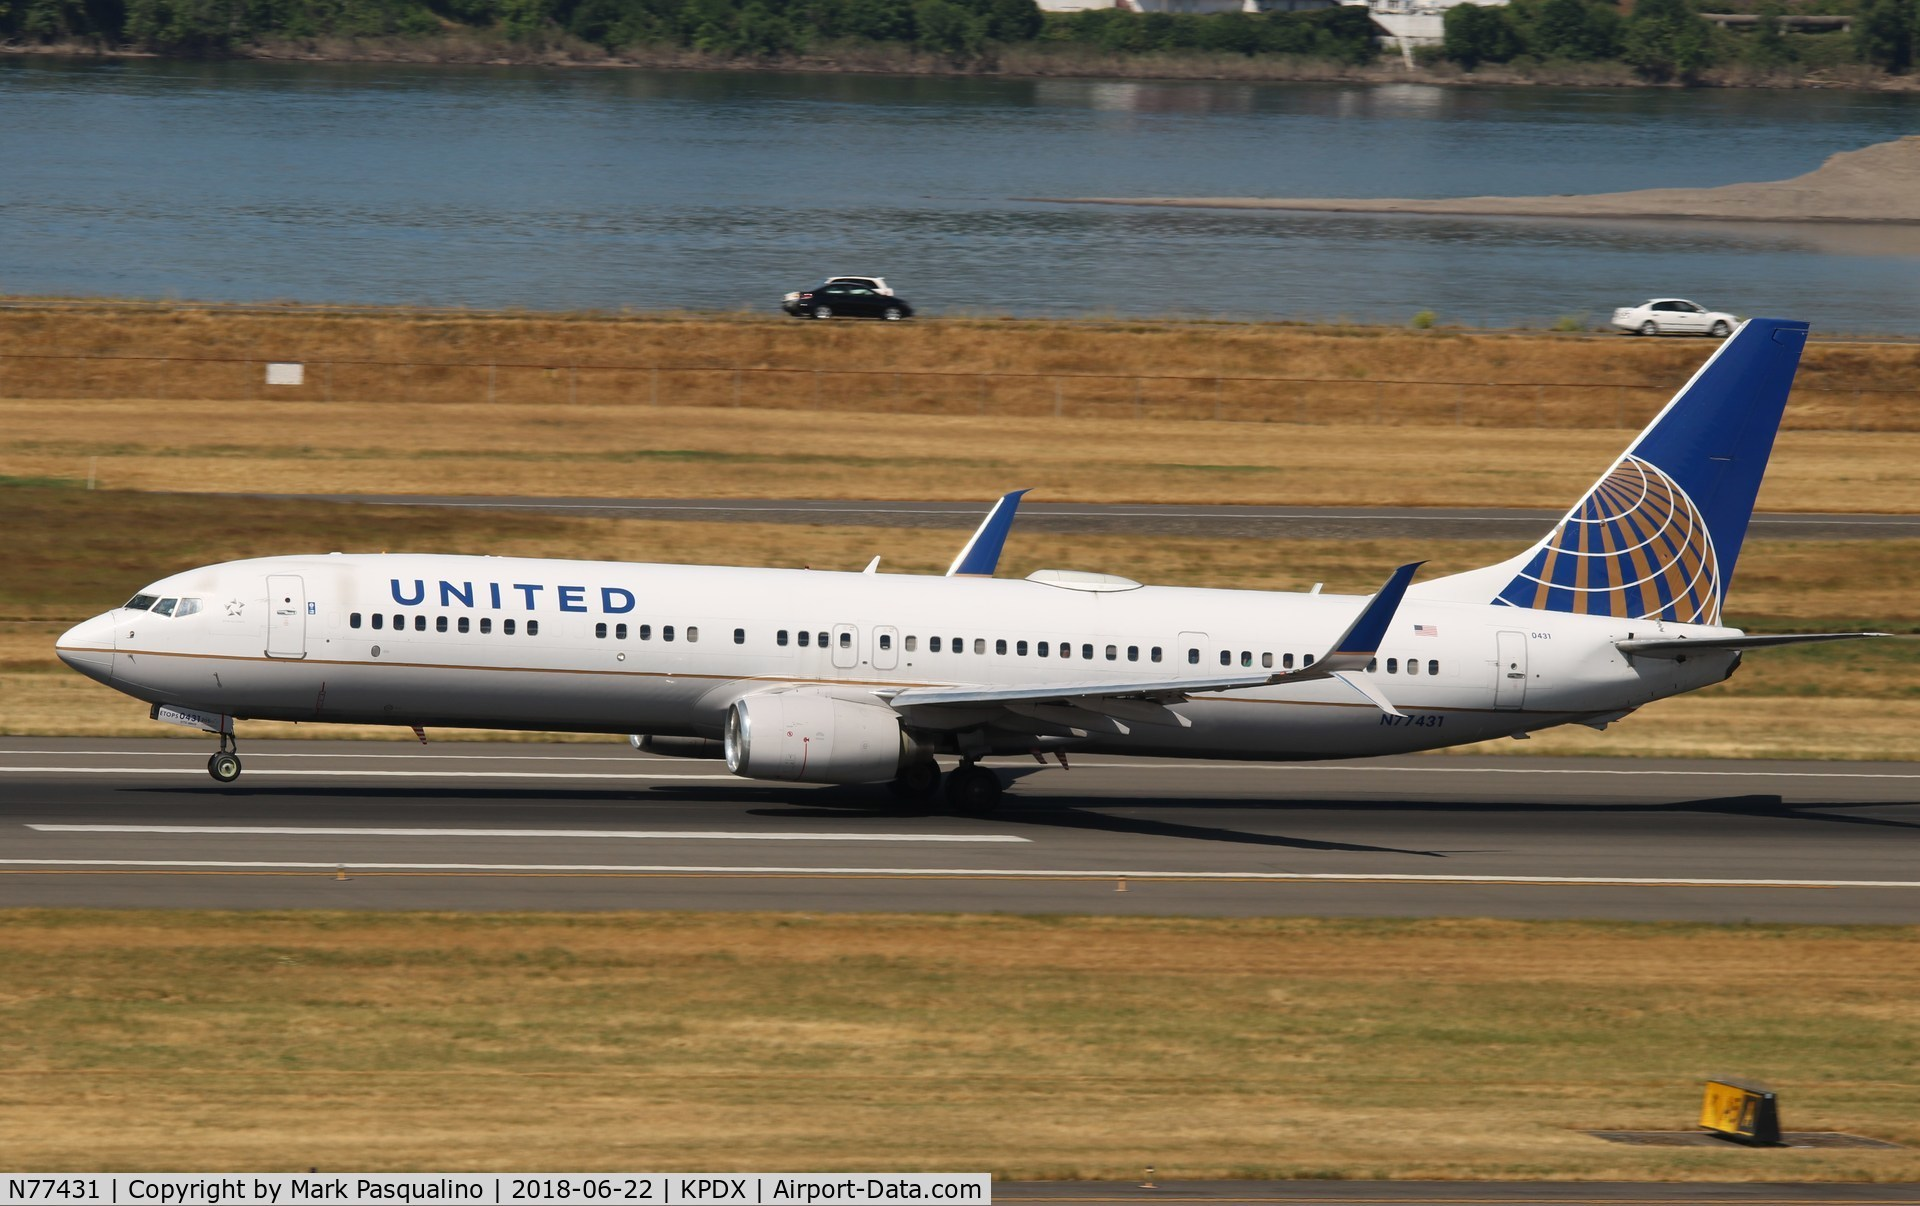 N77431, 2009 Boeing 737-924/ER C/N 32833, Boeing 737-900ER